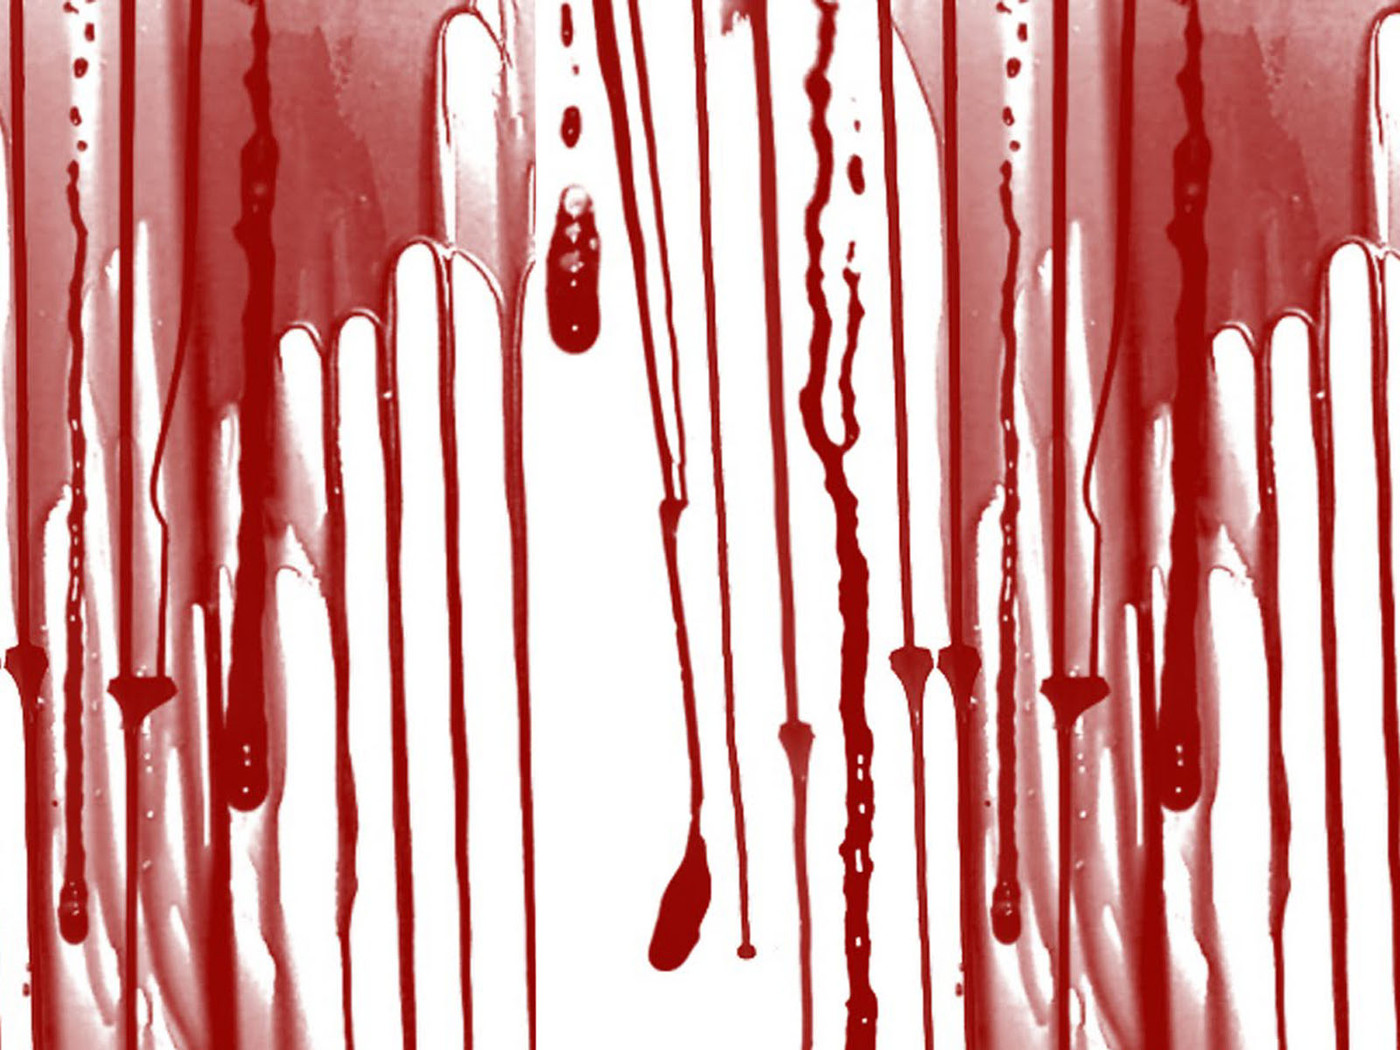 Hot Blood Wallpapers 2.jpg